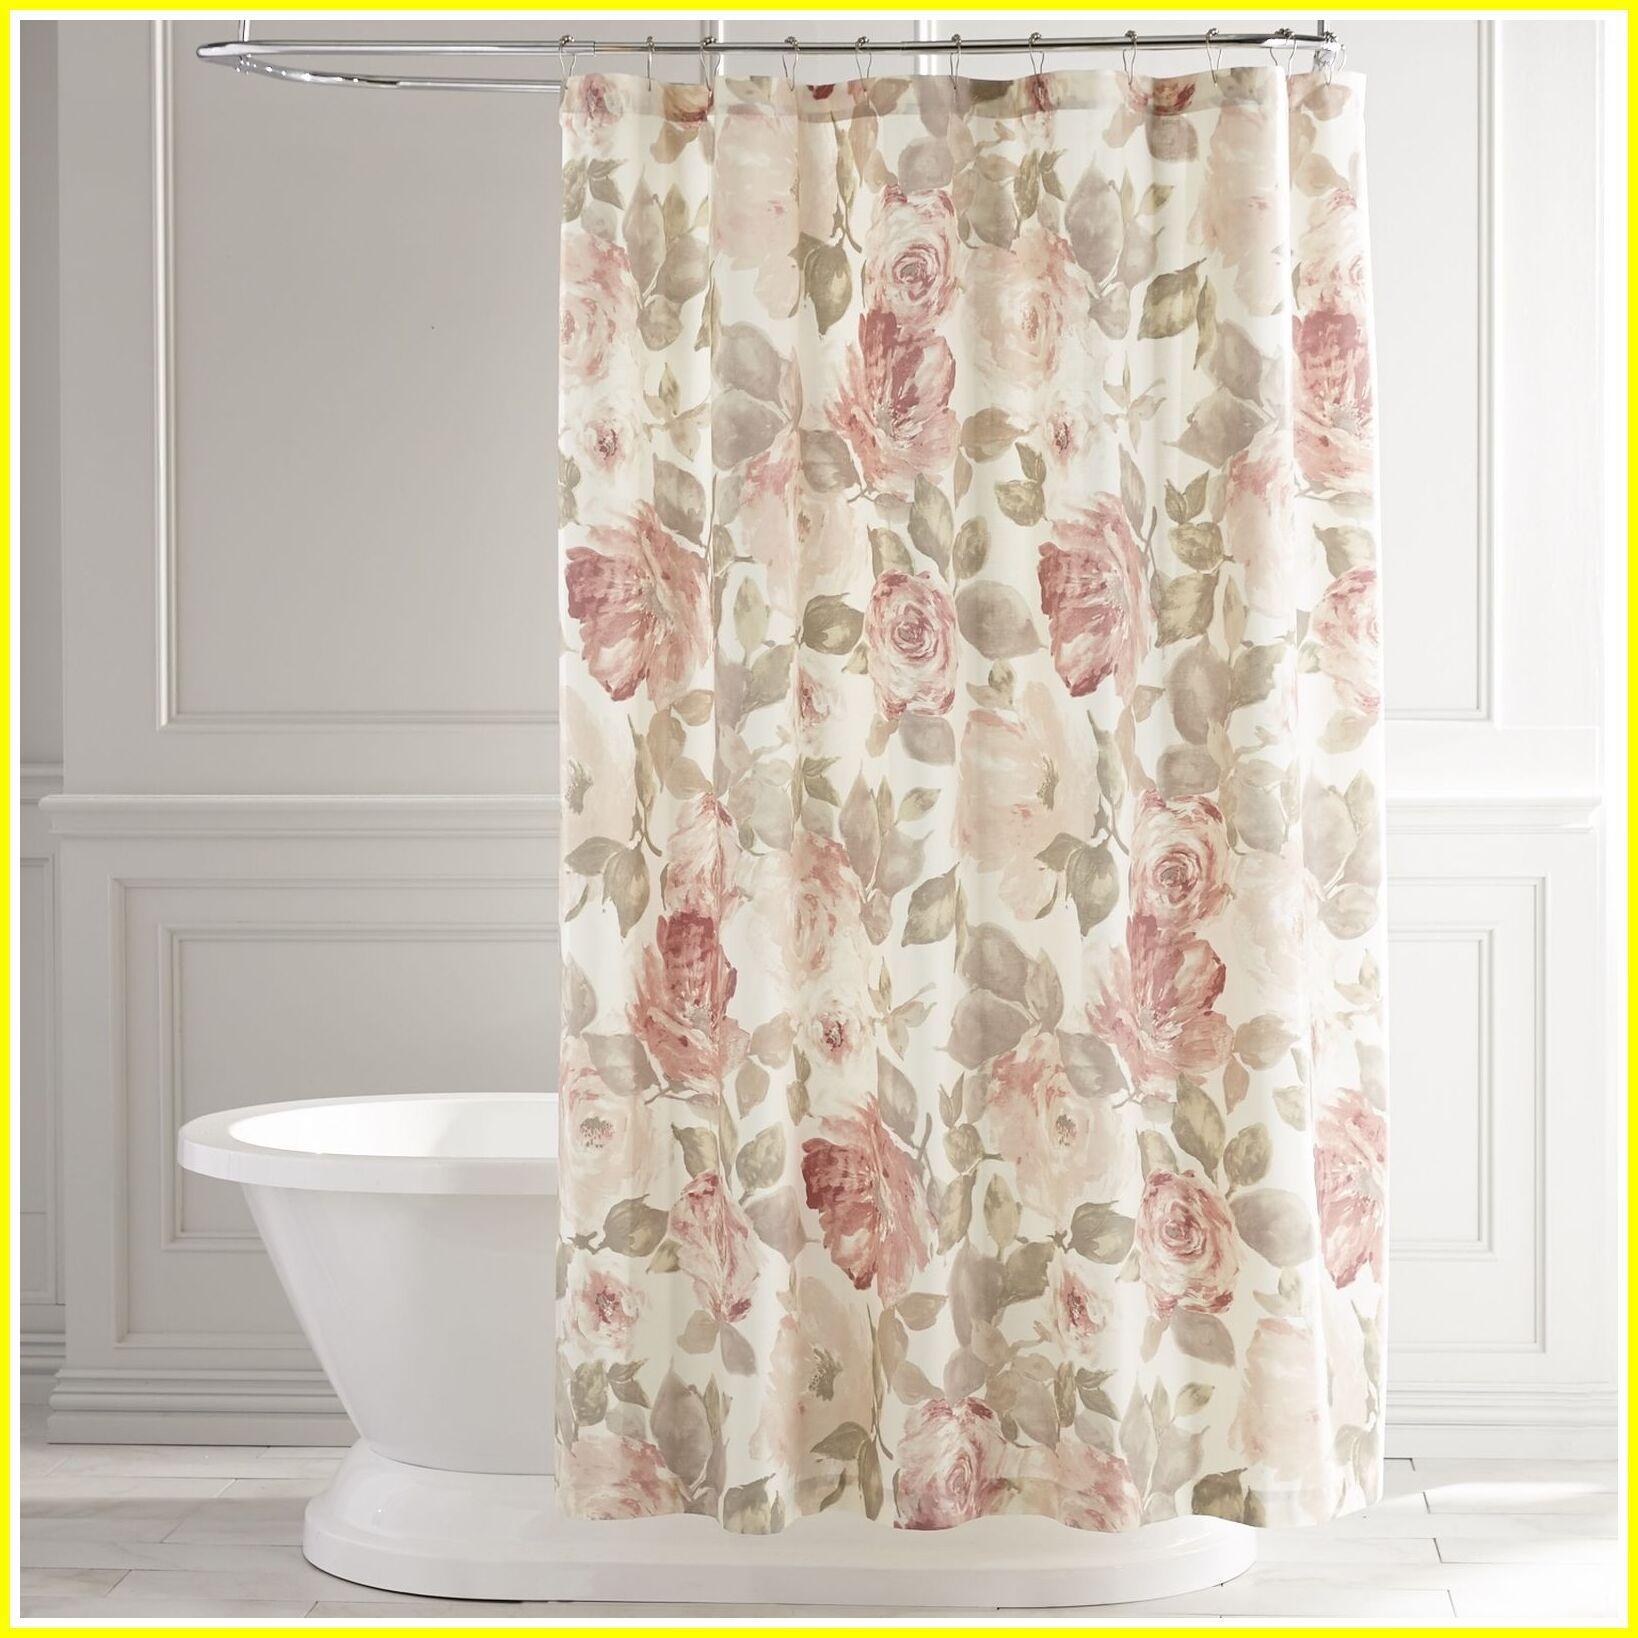 Vintage Style Bathroom Shower Curtains